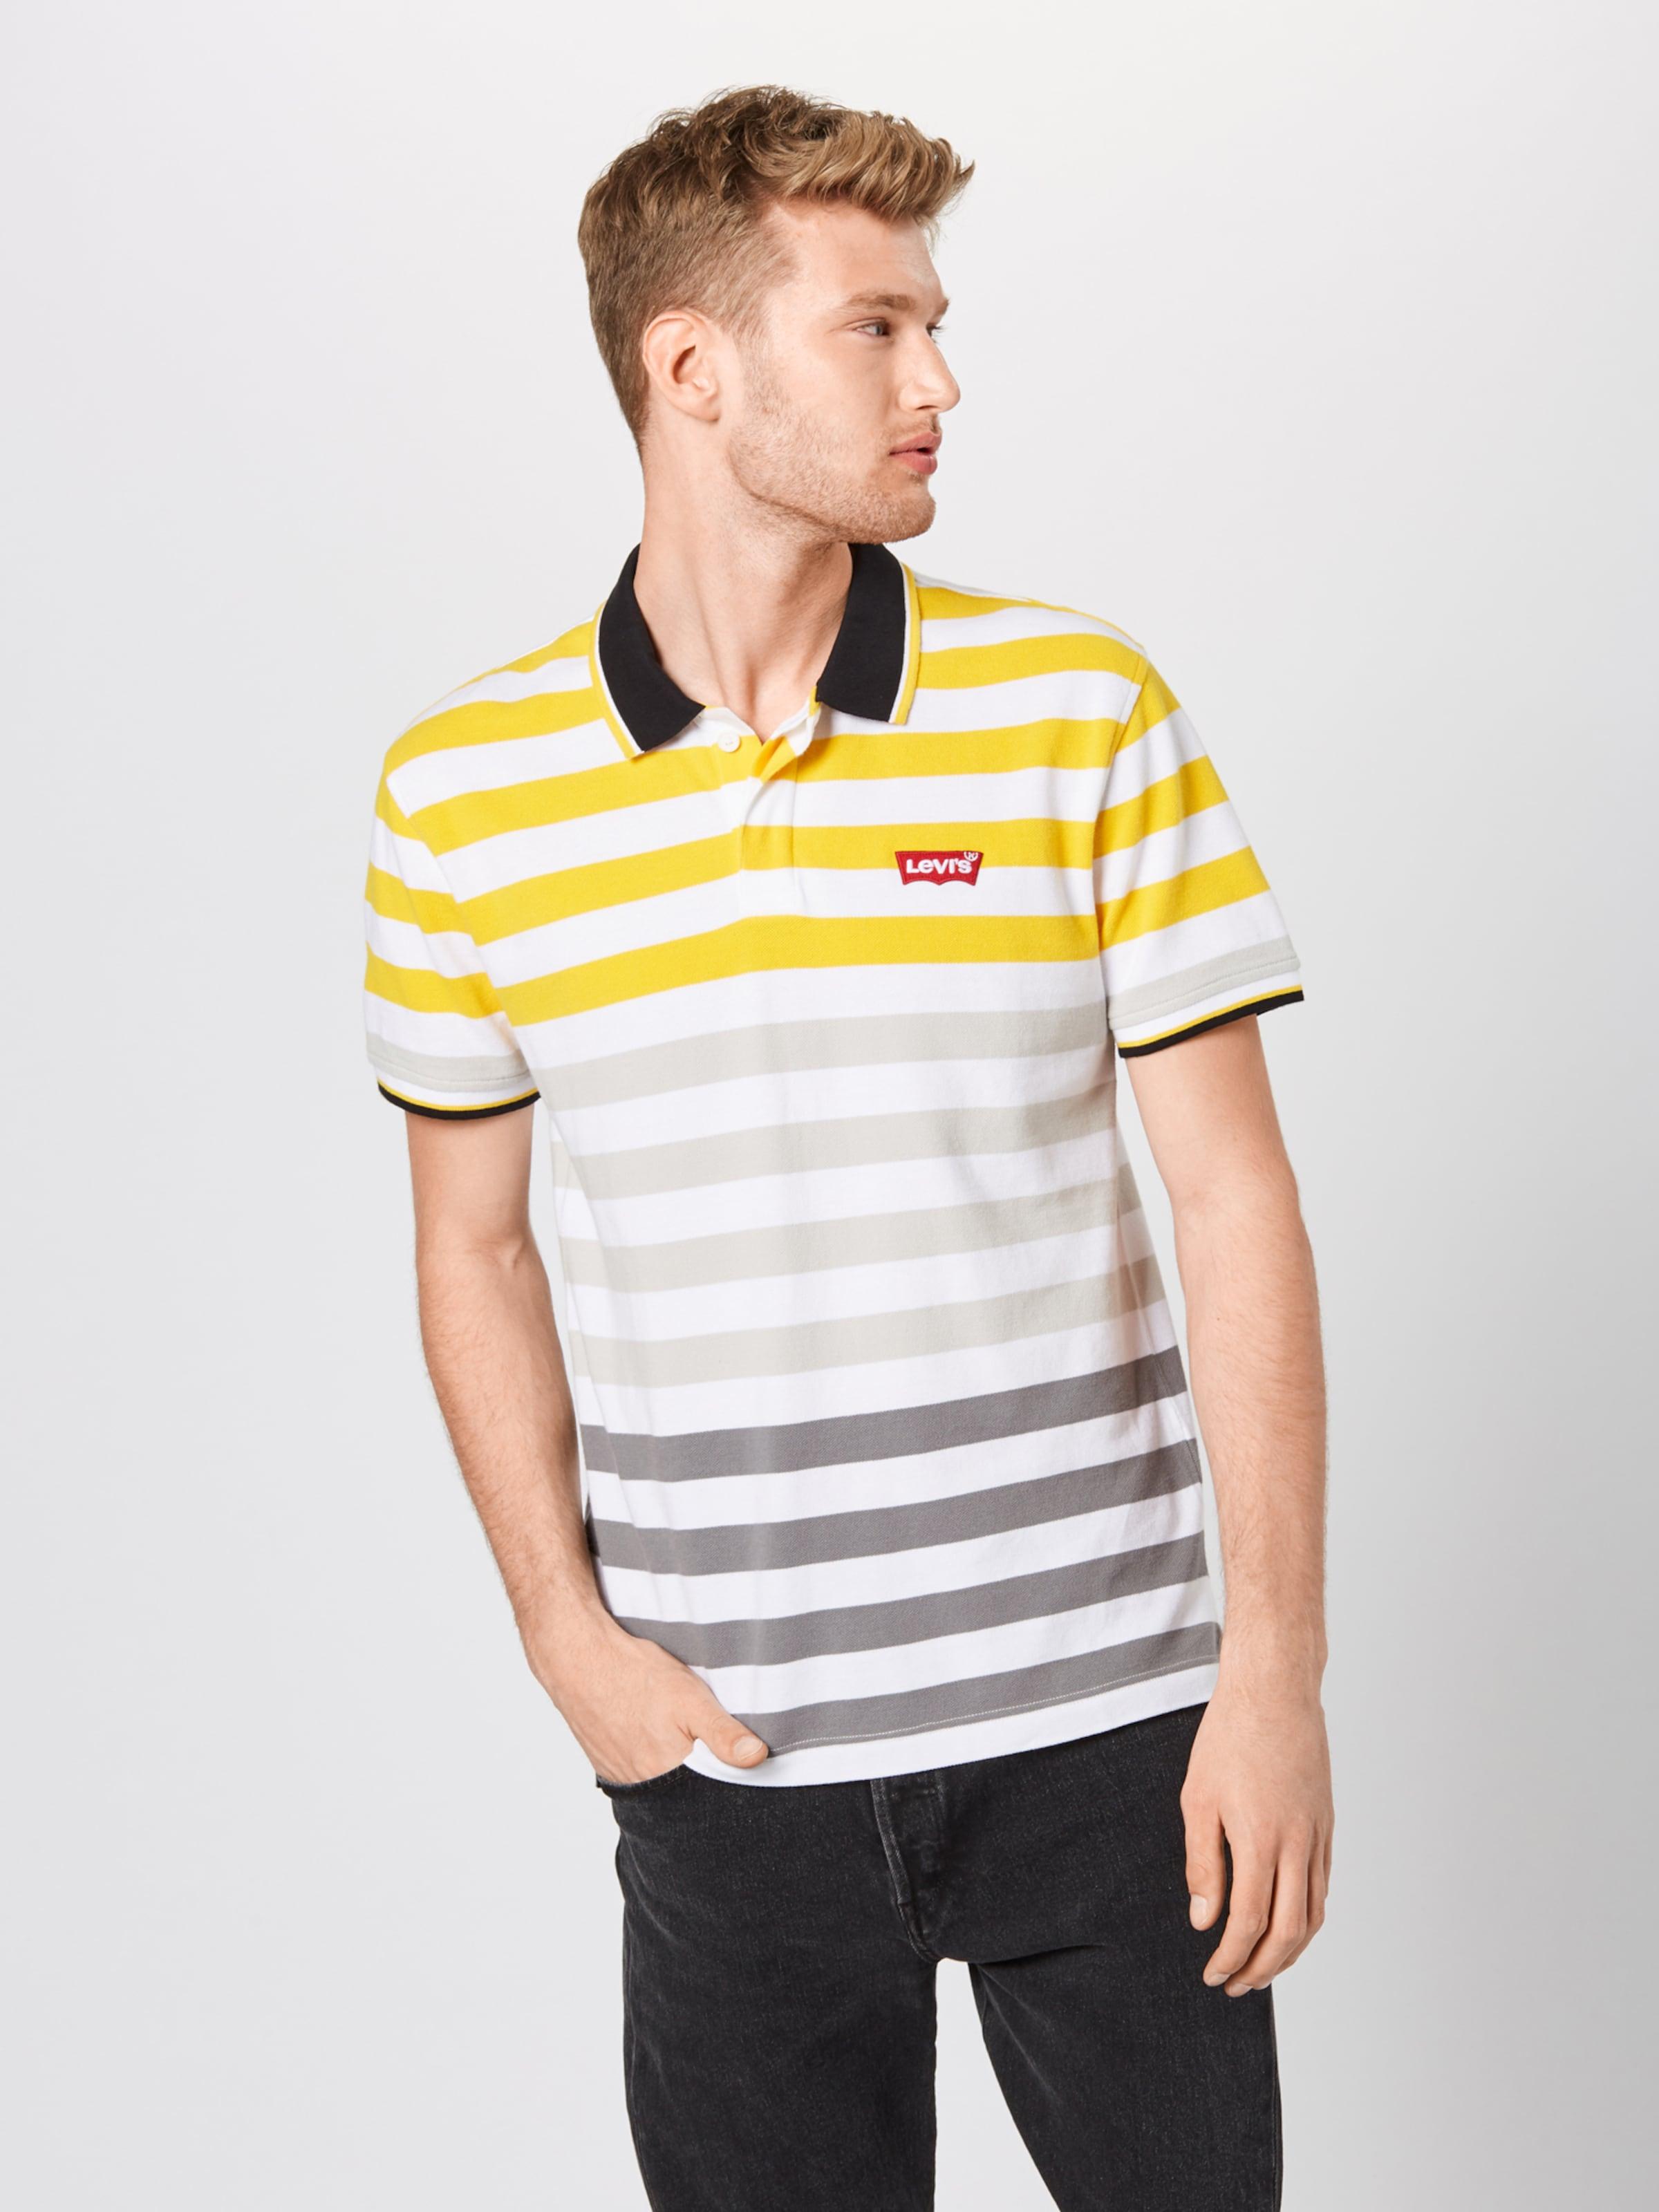 Levi's JauneGris shirt En T Blanc Noir rCxoWdeB